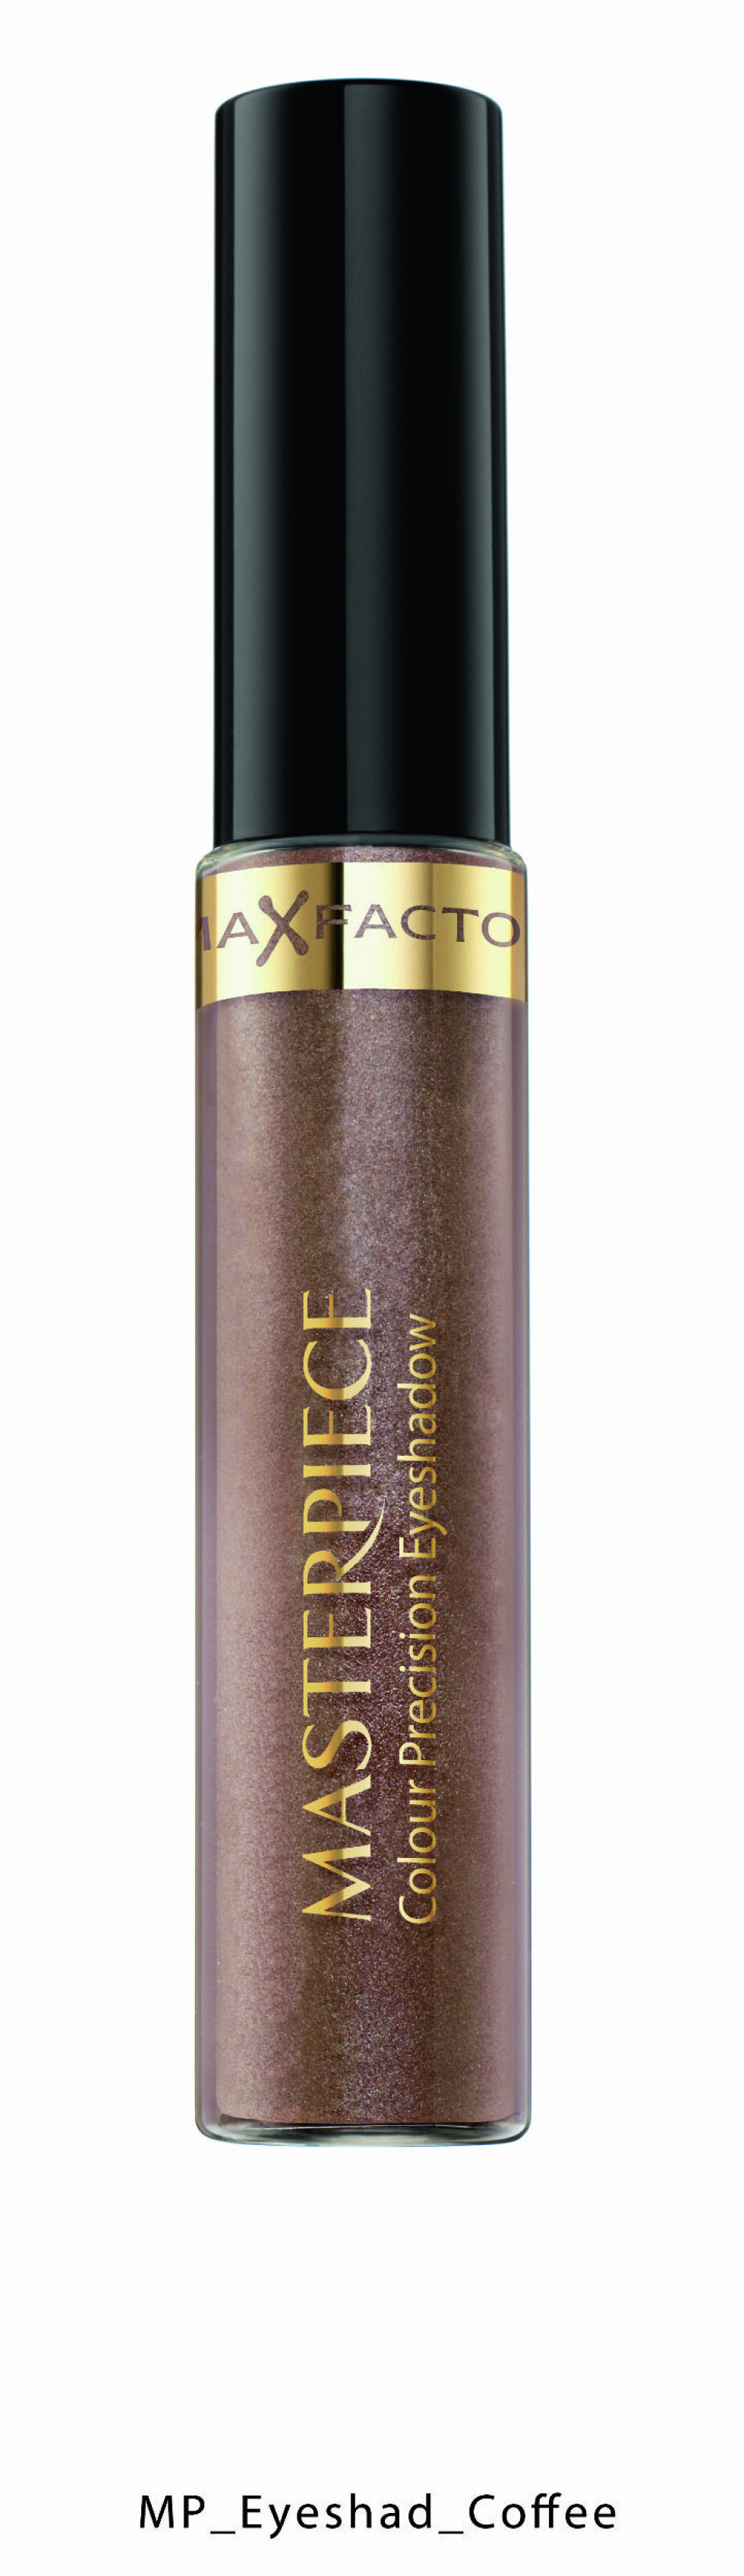 Masterpiece Eyeshadow i Coffee fra MaxFactor, kr 105. Foto: Produsenten